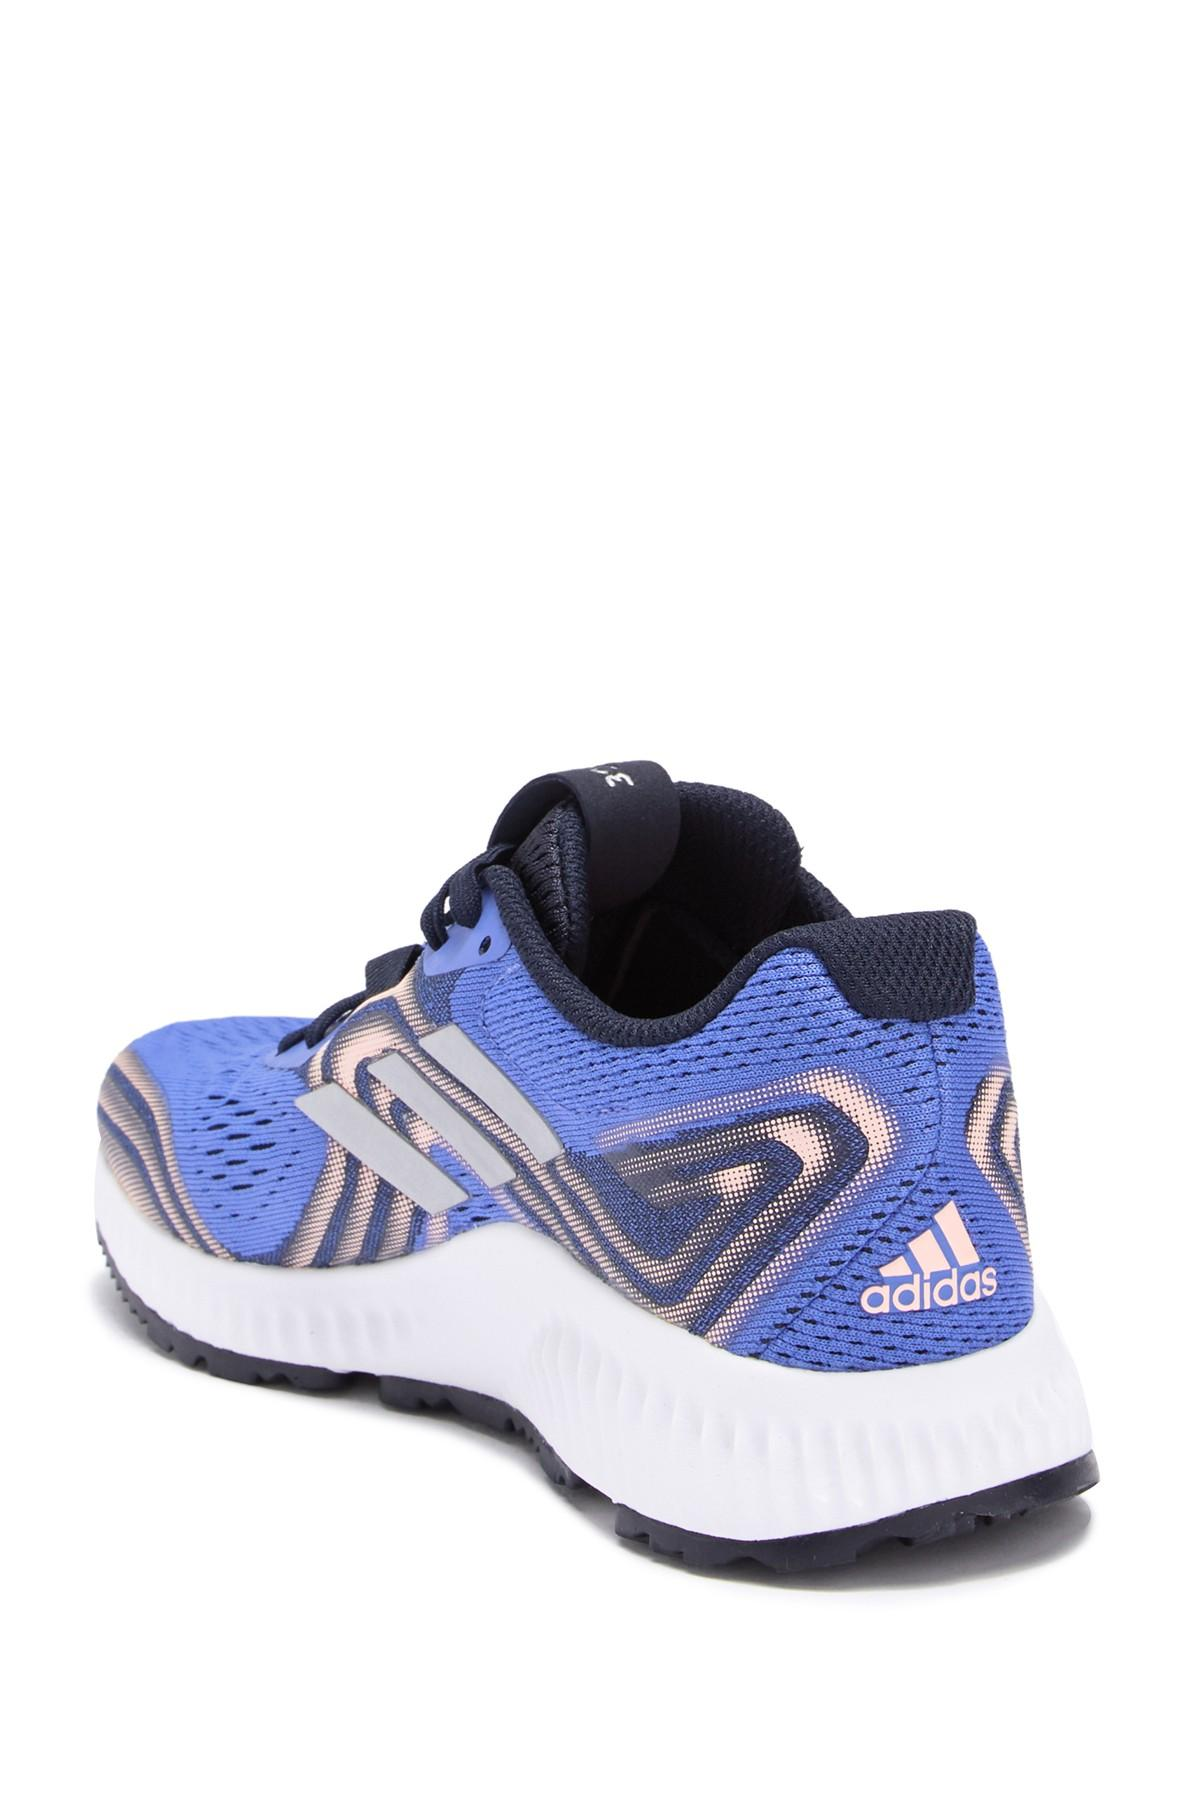 adidas Aerobounce 2 Running Shoe in